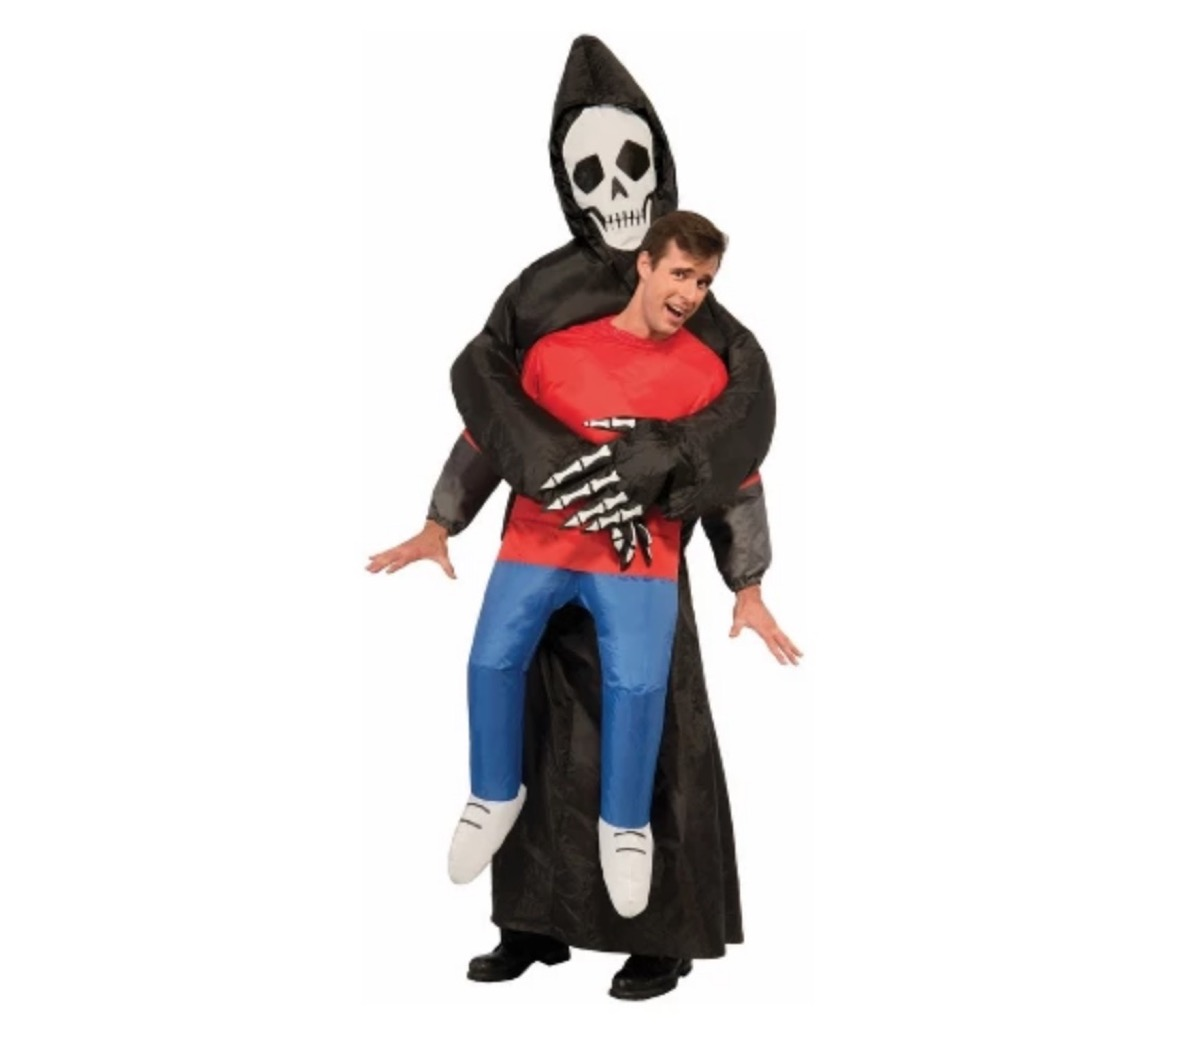 inflatable grim reaper costume, target halloween costumes